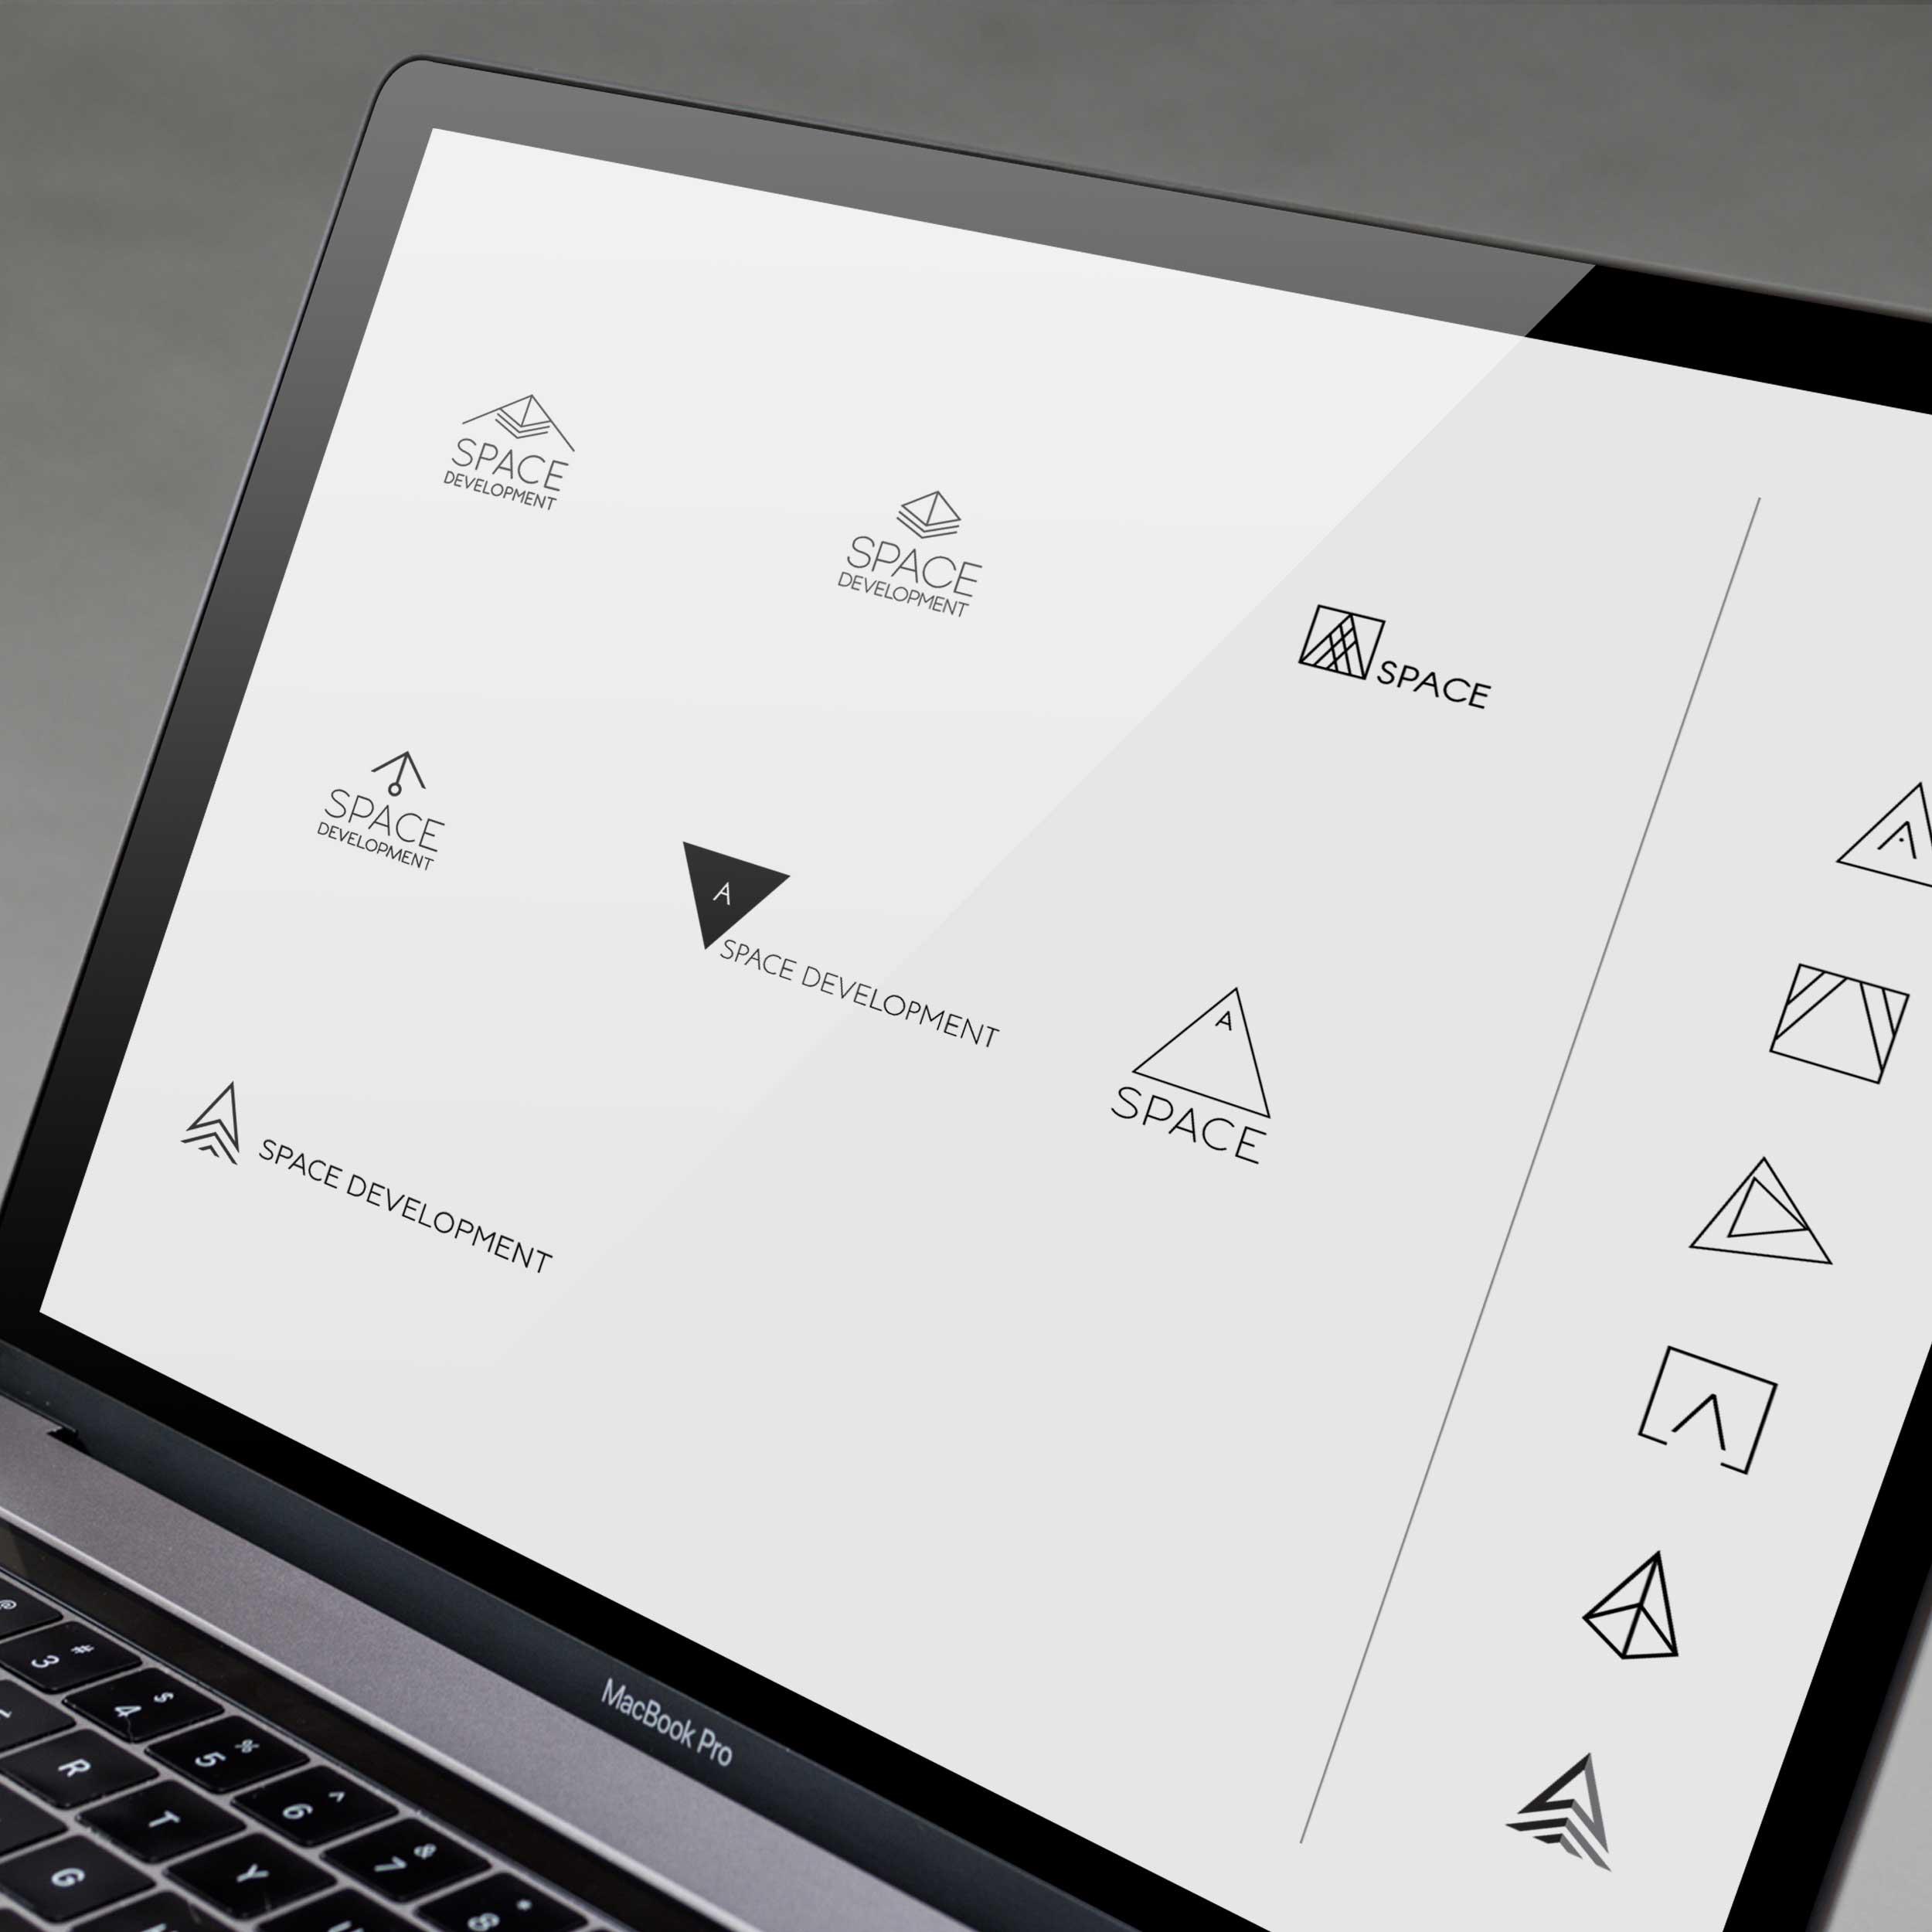 Logo-versions2-A-Space-Development.jpg